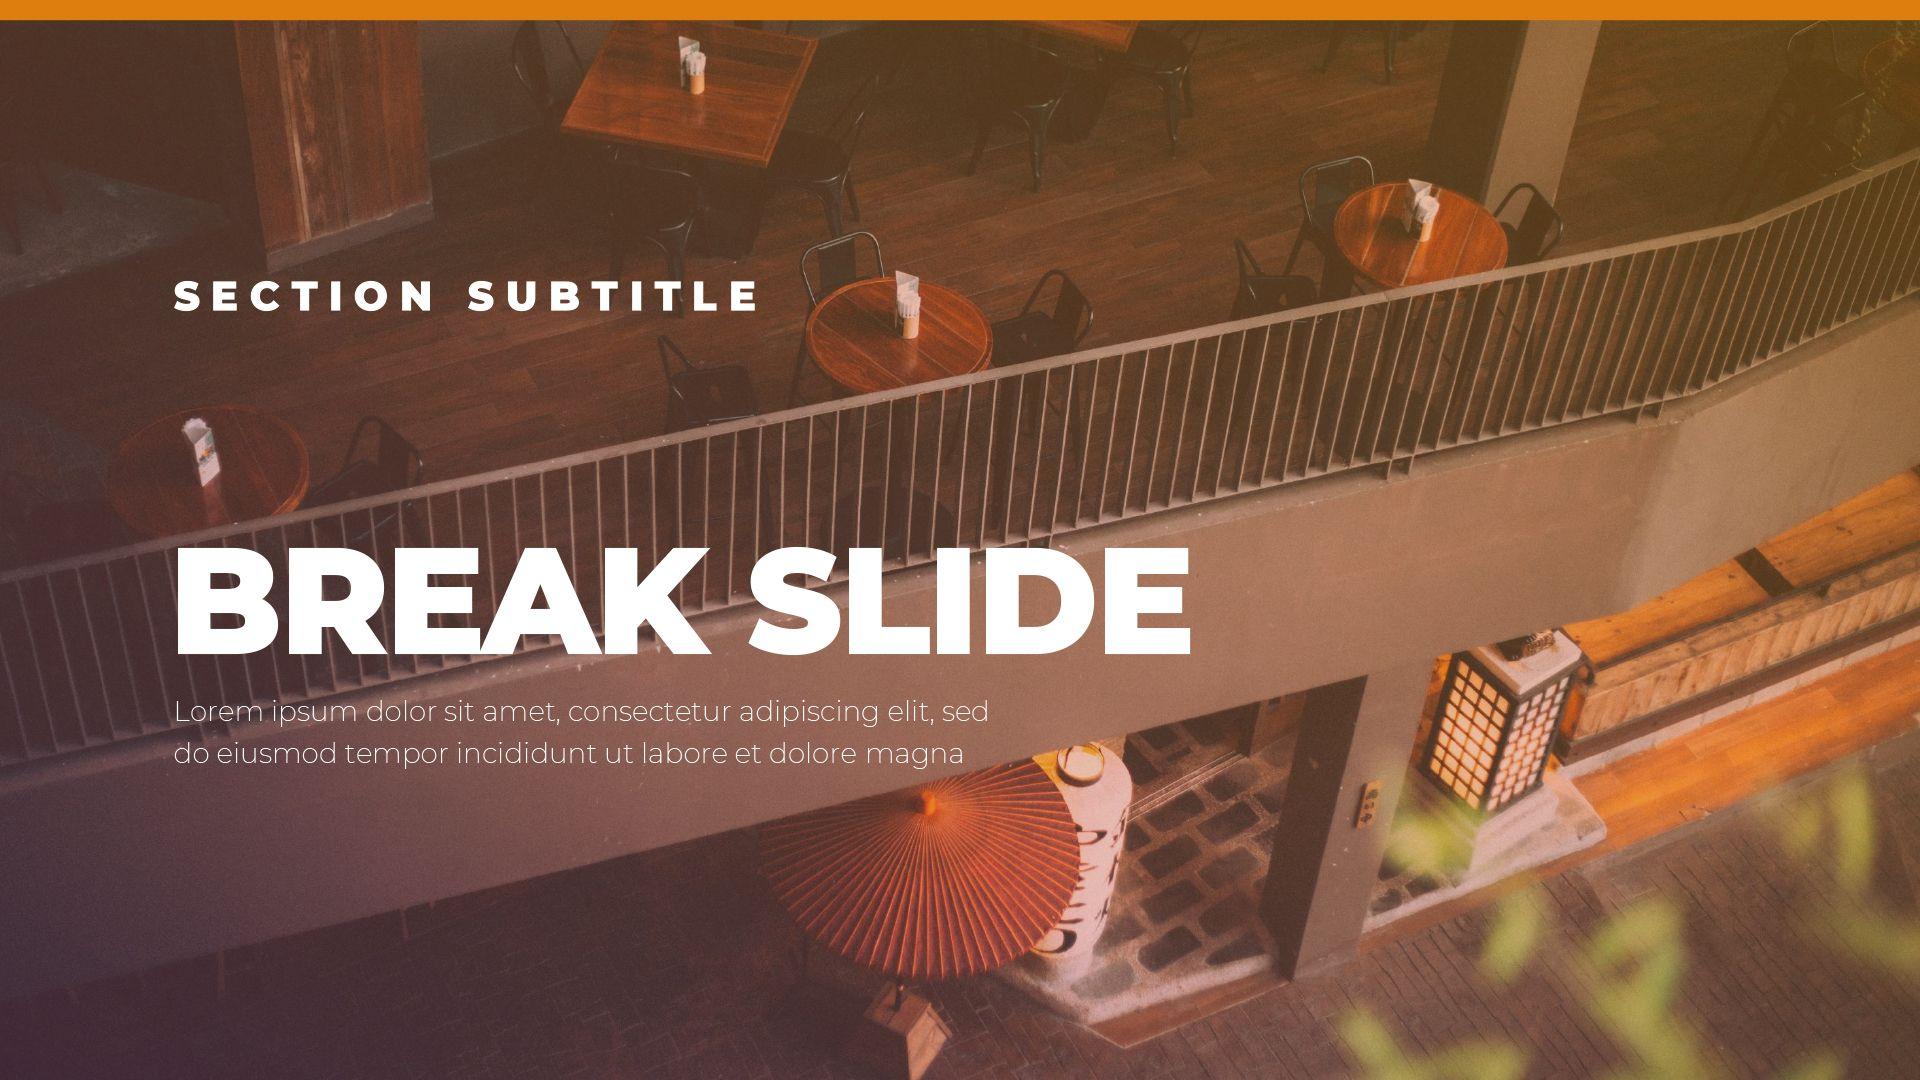 Tasty Restaurant Google Slides Restaurant Tasty Slides Google Delicious Restaurant Keynote Template Good Luck Wishes